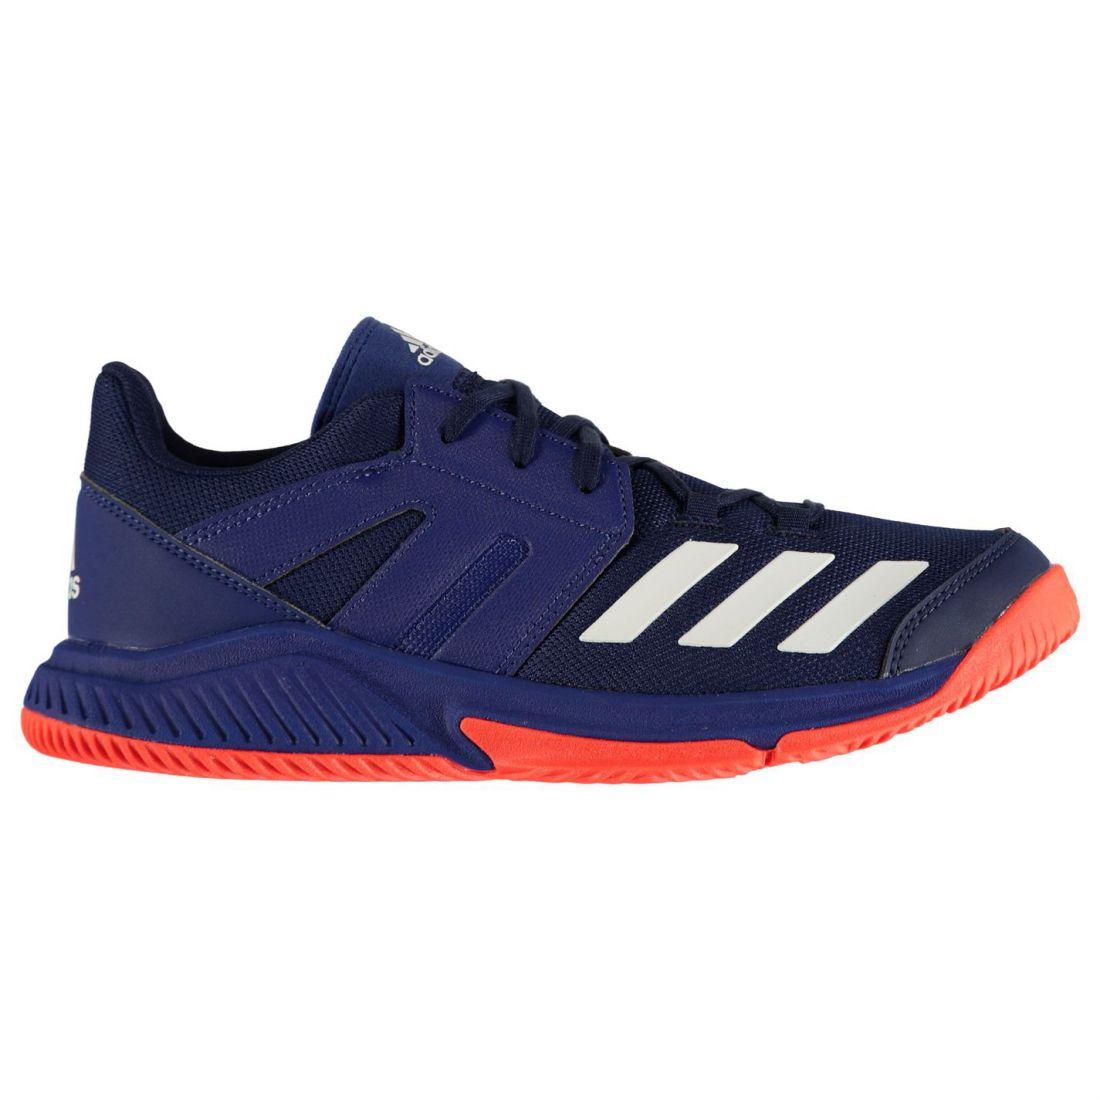 Adidas Essence Ind Mens Gents Squash shoes